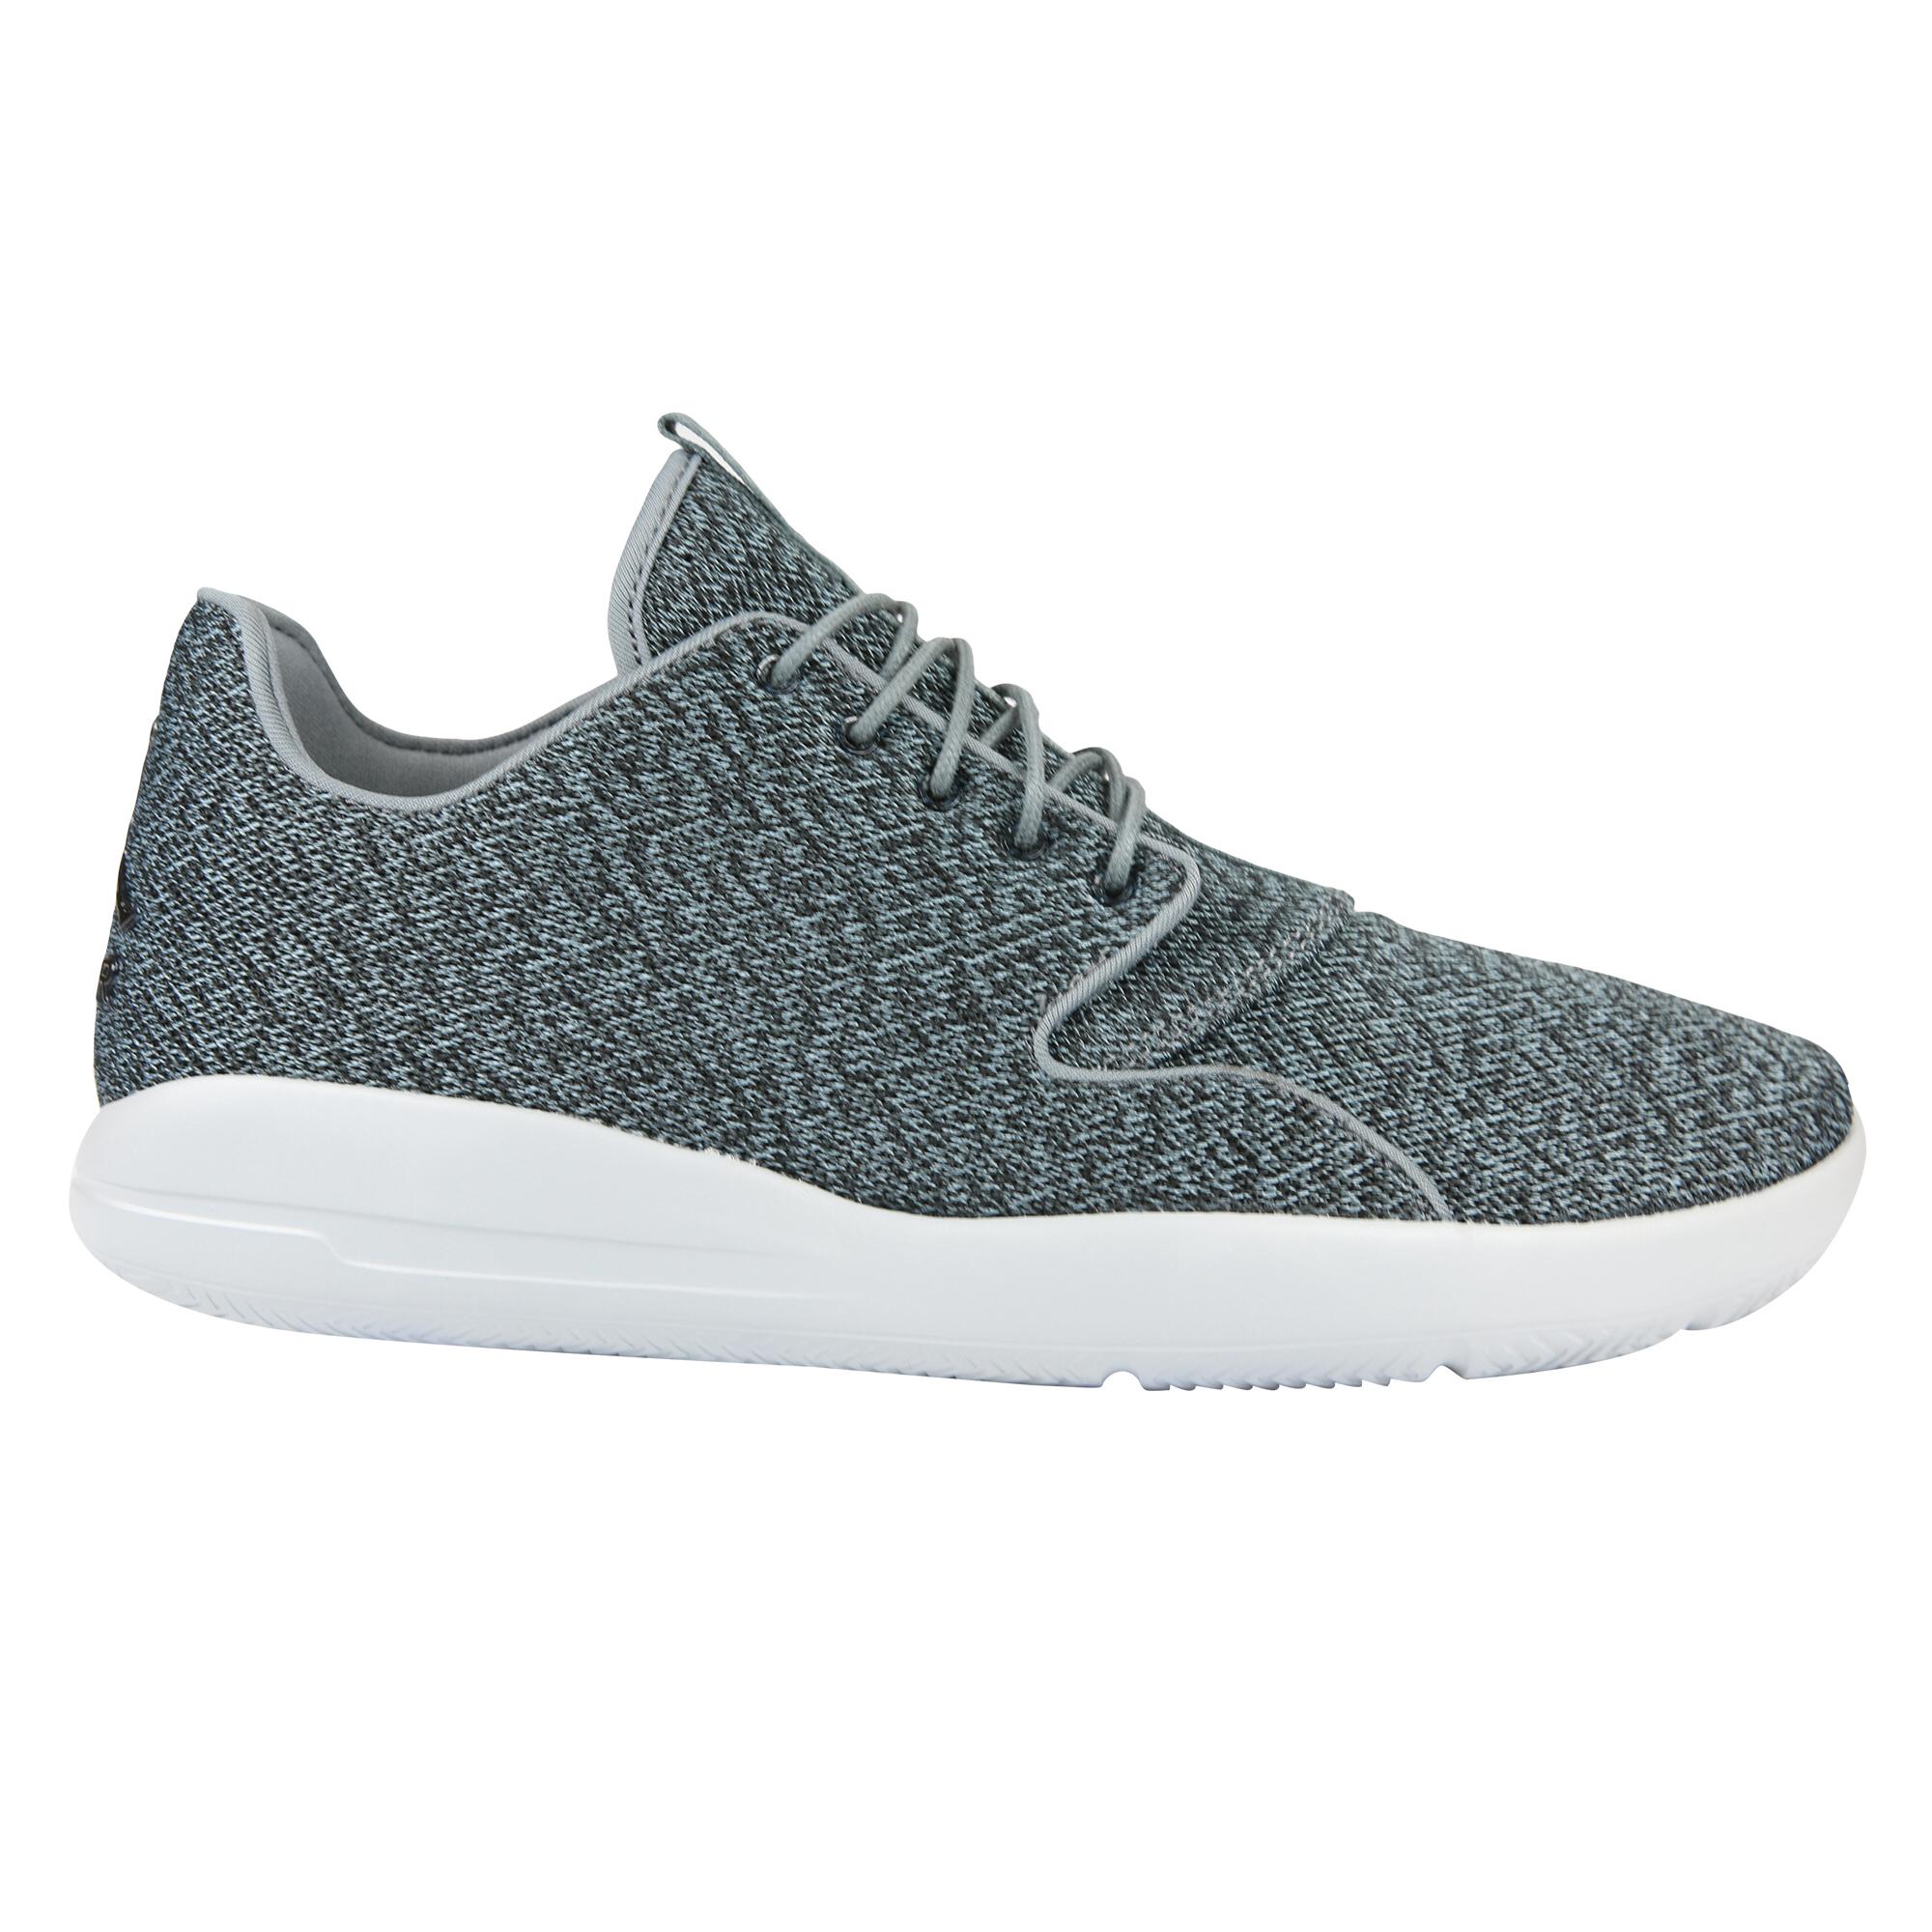 Nike Jordan Herren Eclipse Schuhe Turnschuhe Sneaker Herren Jordan a515b0